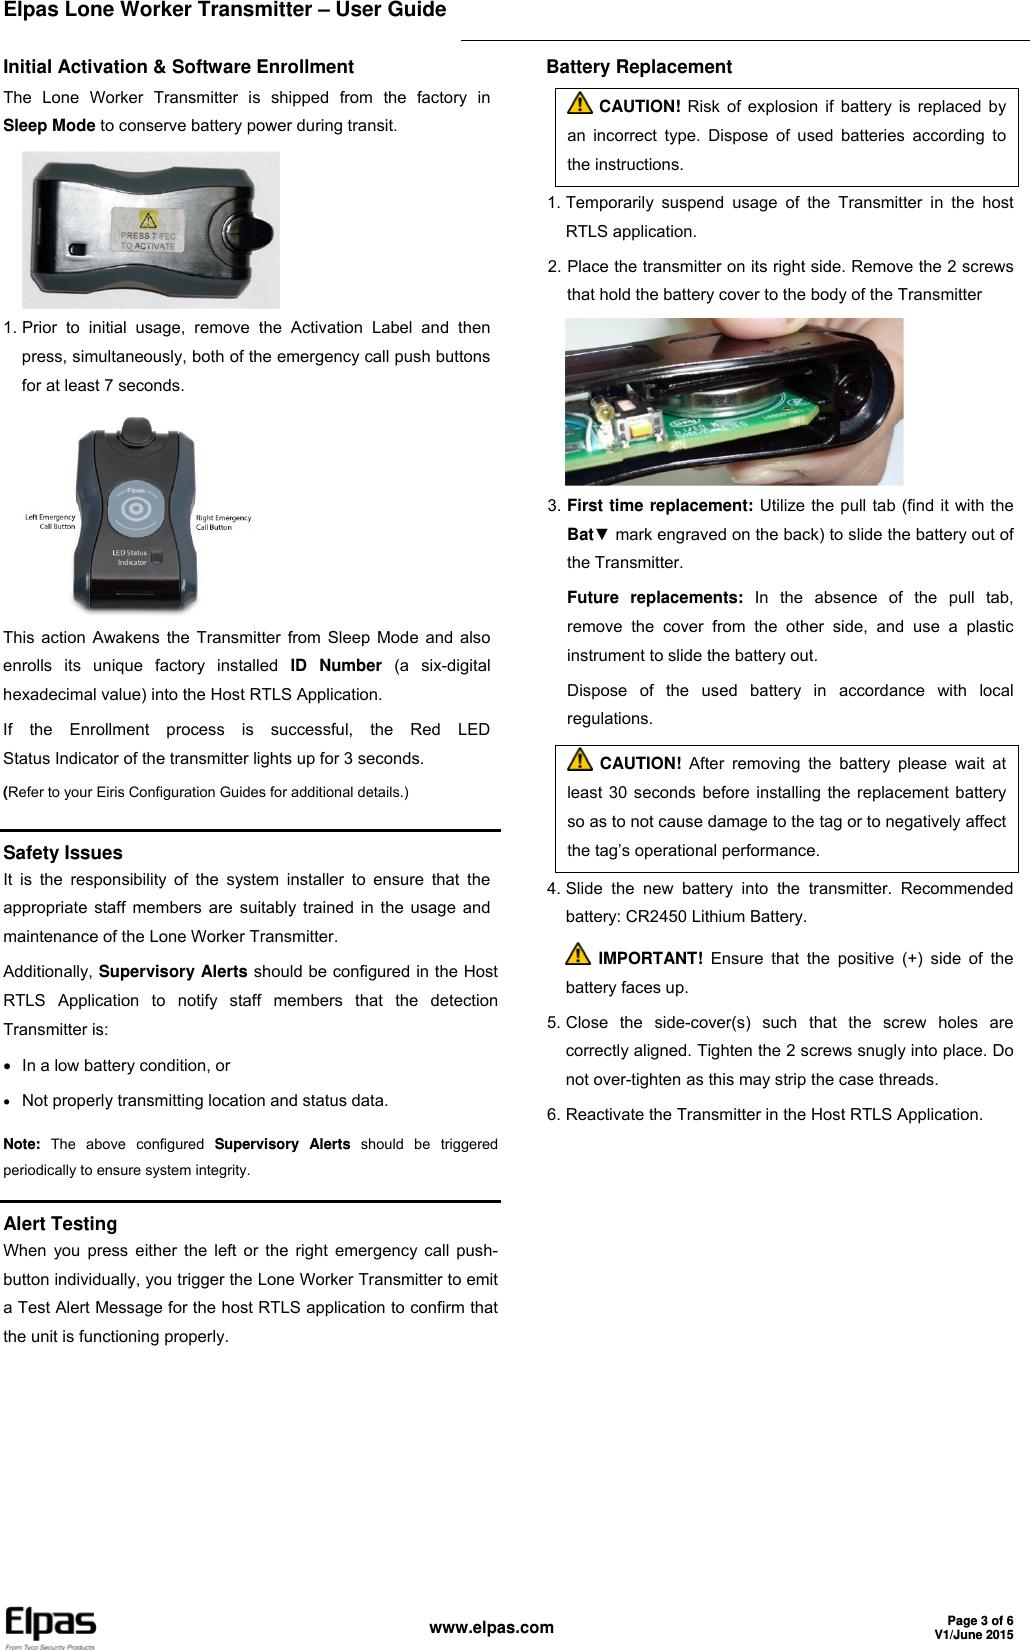 Audioconexus ir/rf/rfid guides